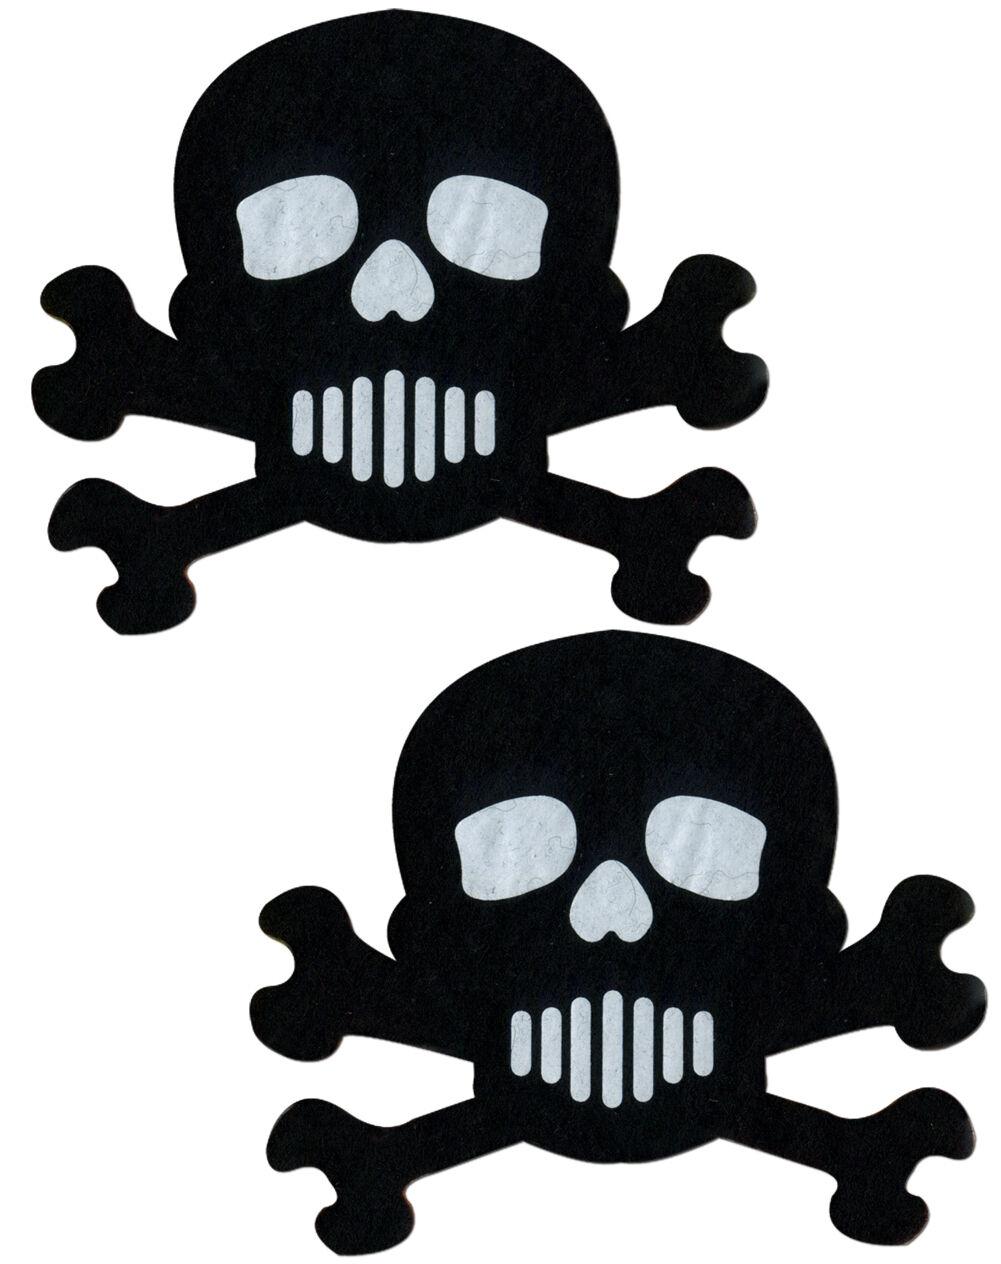 Pastease Skulls Skull Black Rave Reusable Dancer Breast Pasties HALLOWEEN 2017